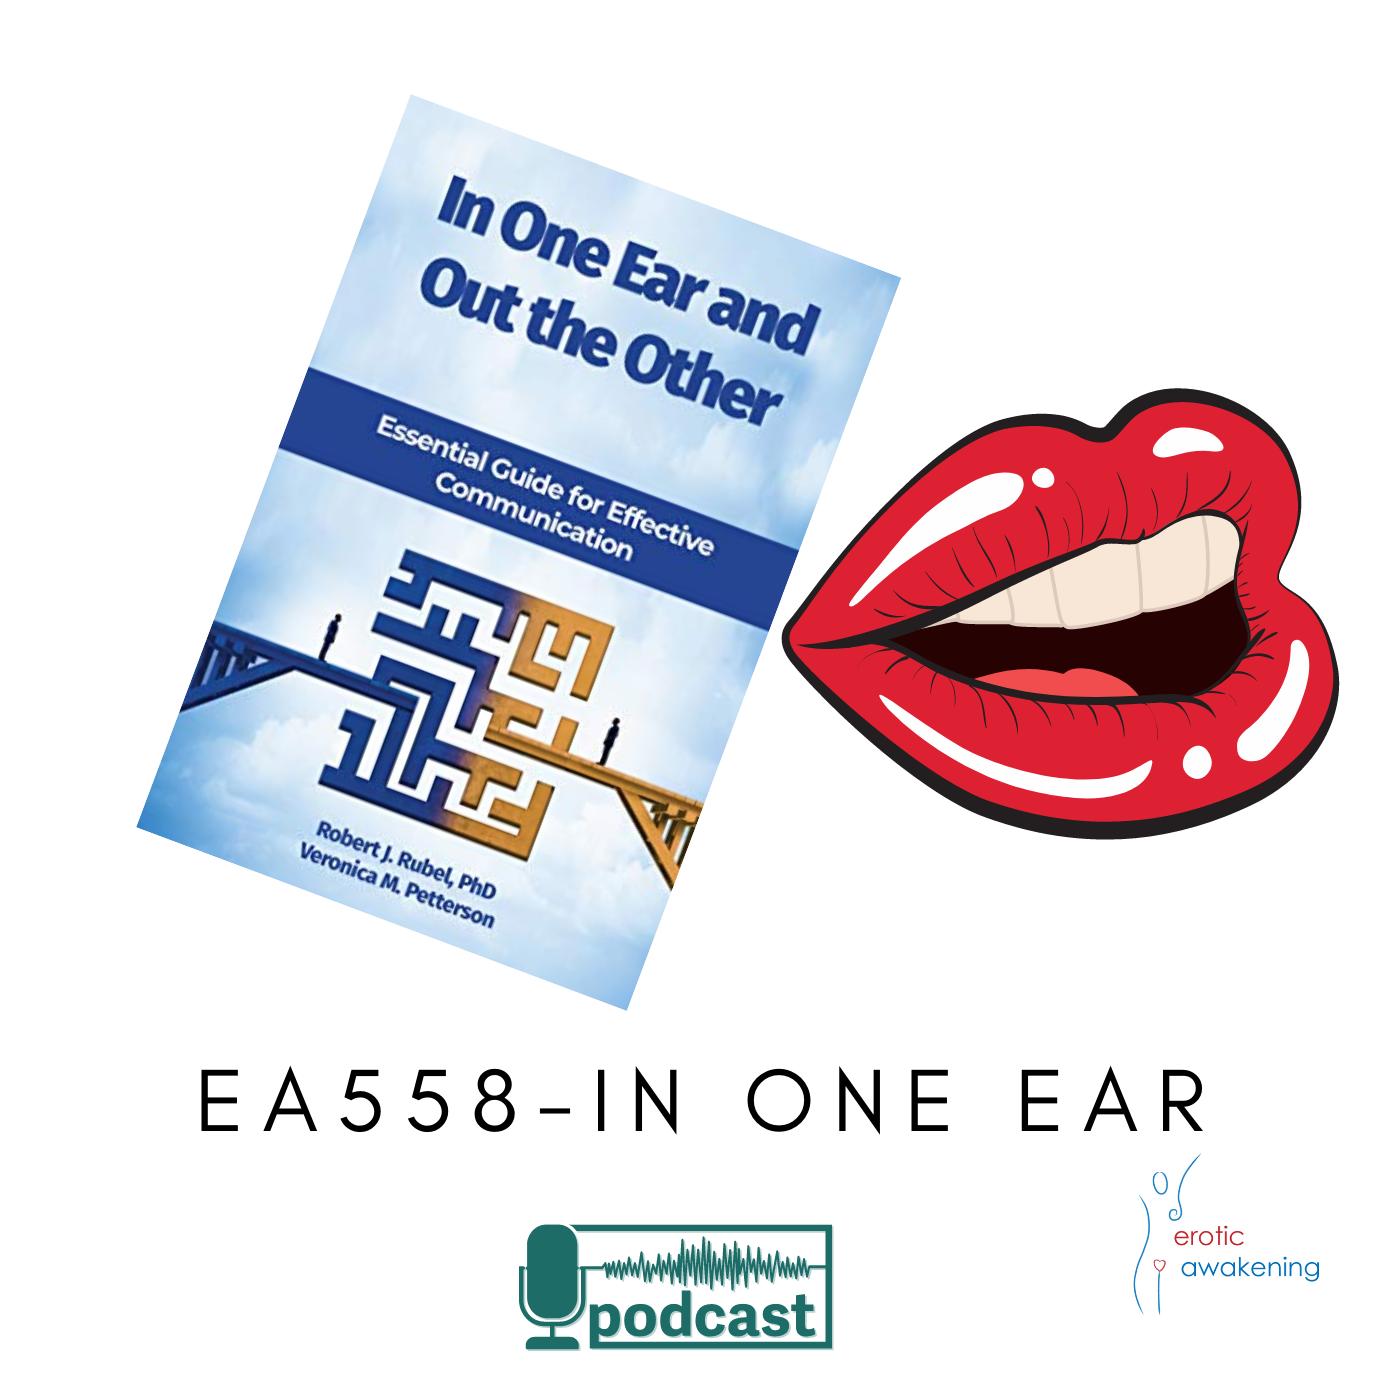 Erotic Awakening Podcast - EA558 - In One Ear